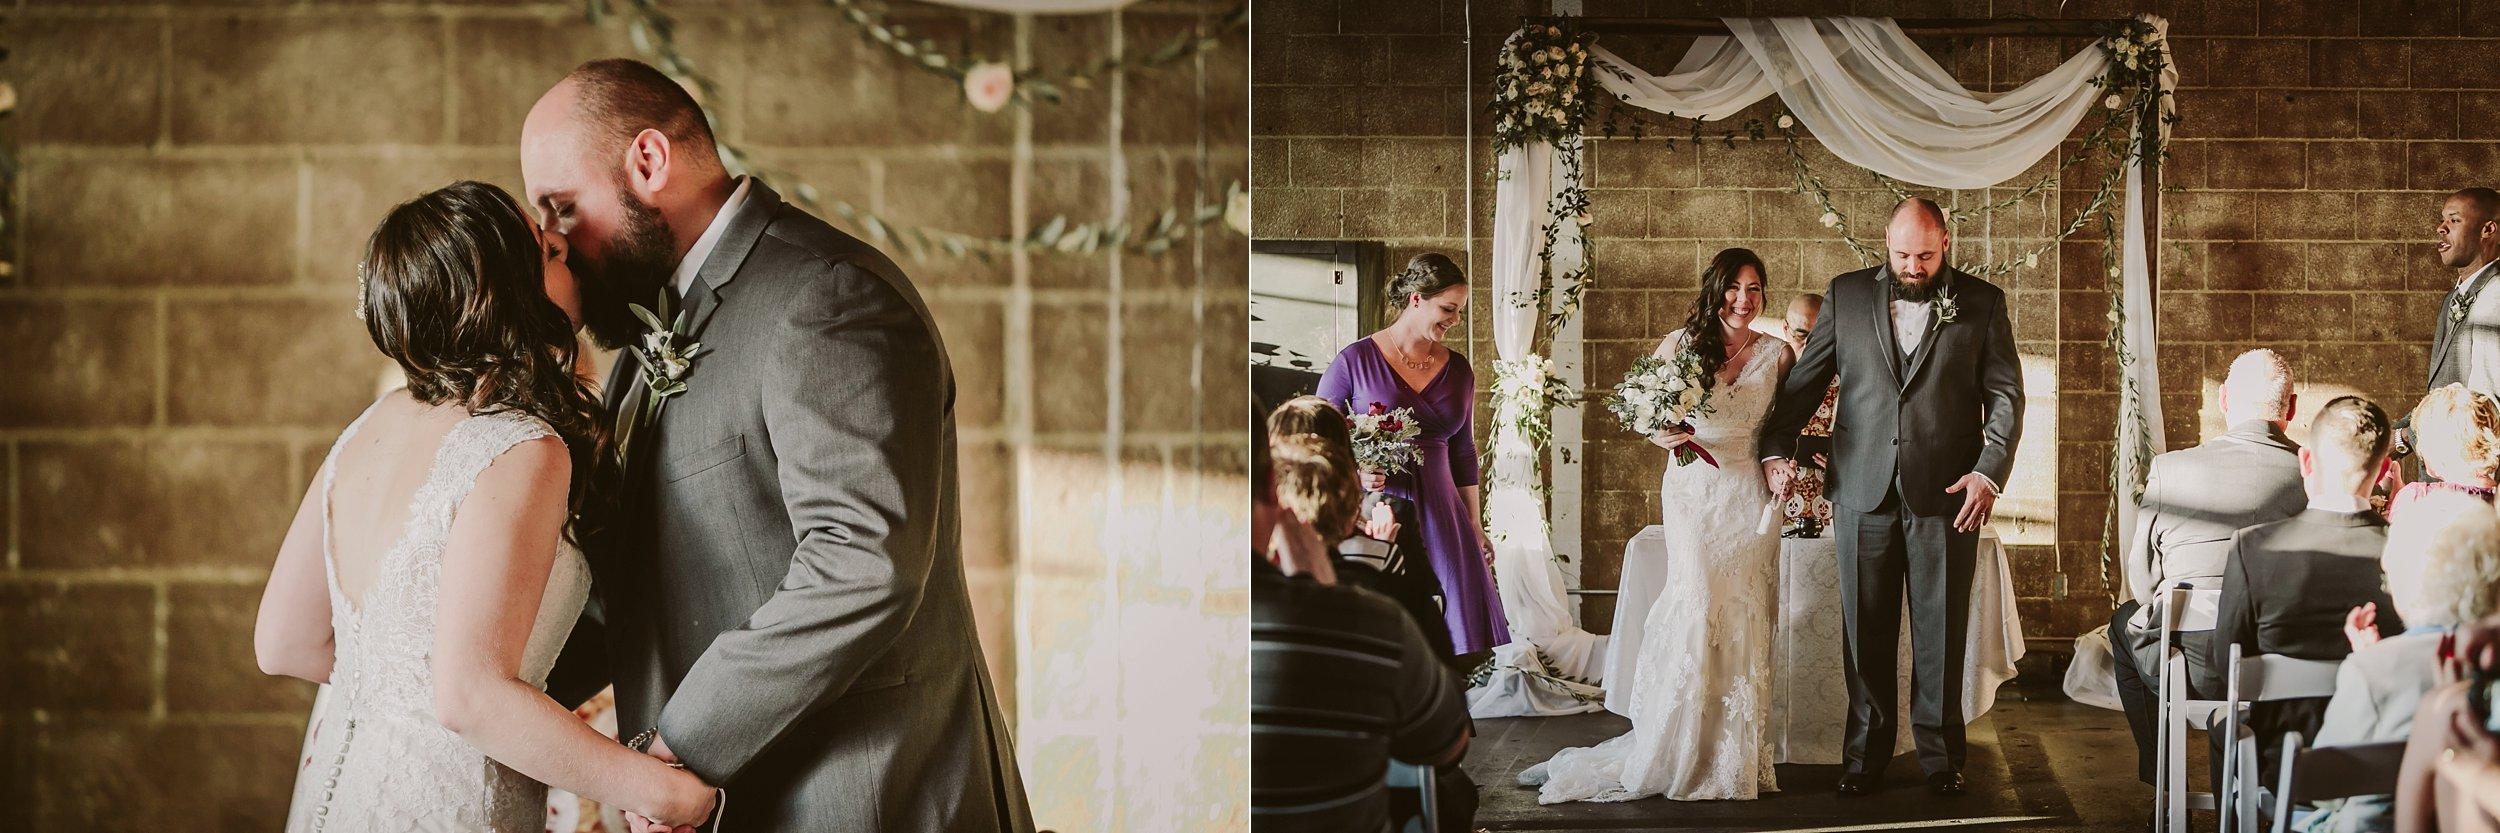 Smoky Hollw Studios Wedding_0023.jpg